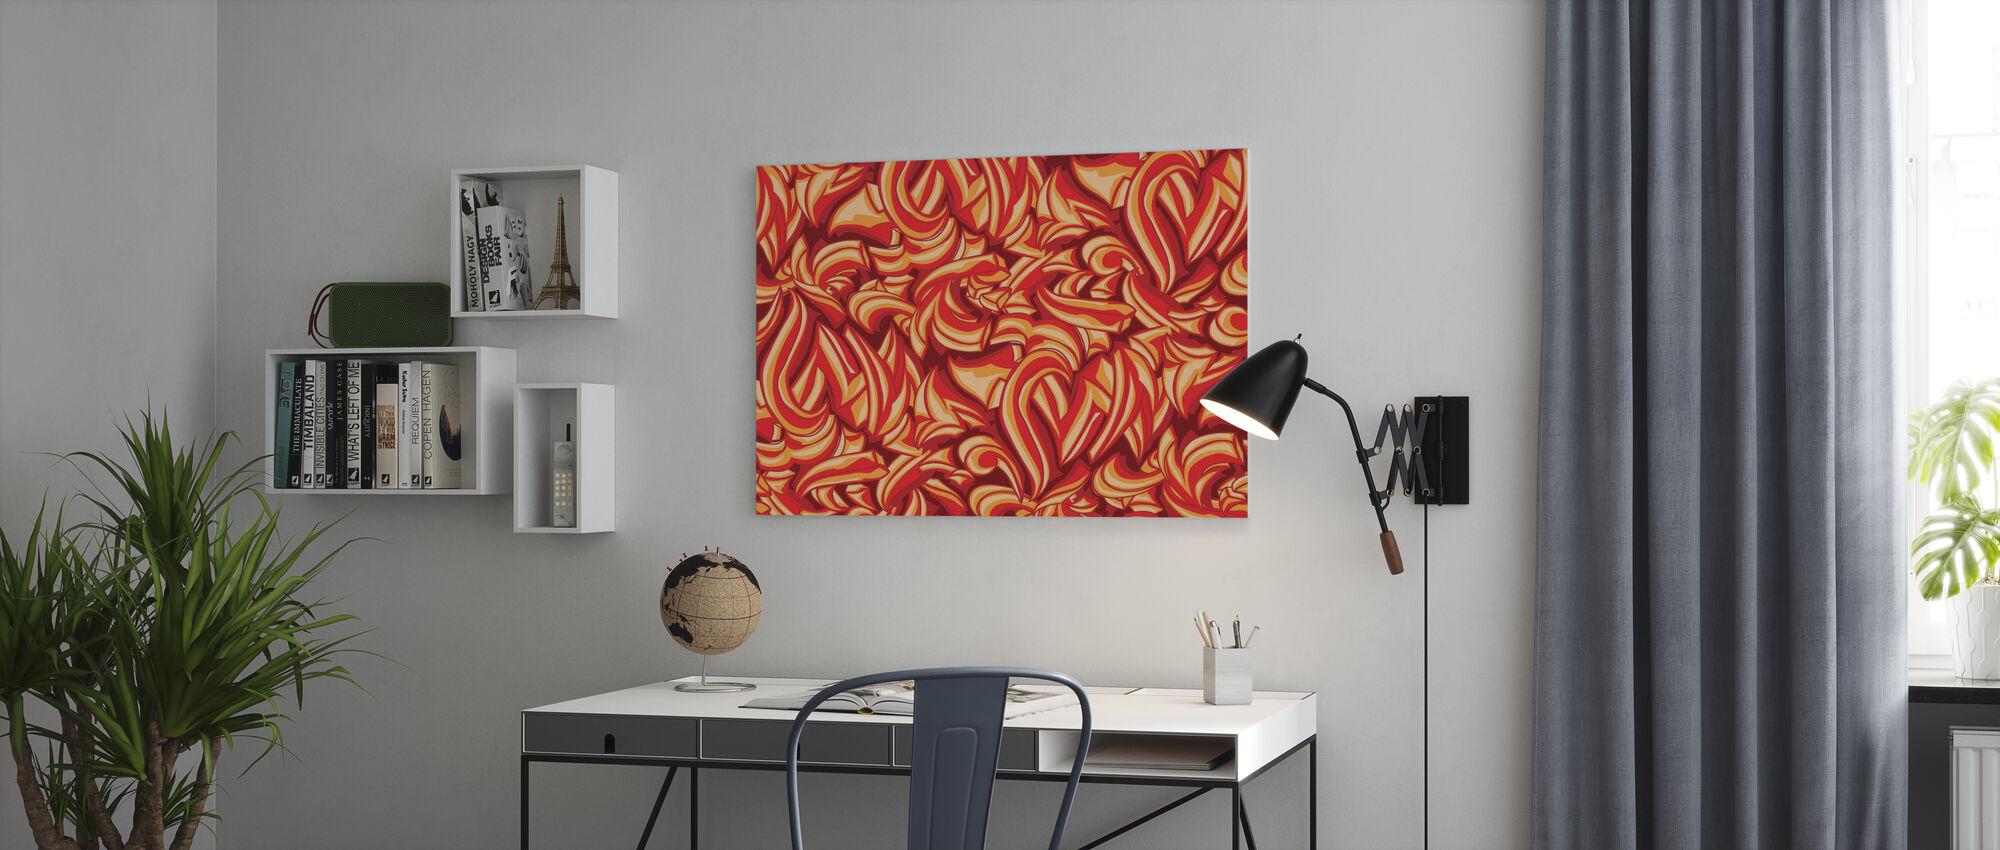 Graffiti Splat Sketchy - Impression sur toile - Bureau